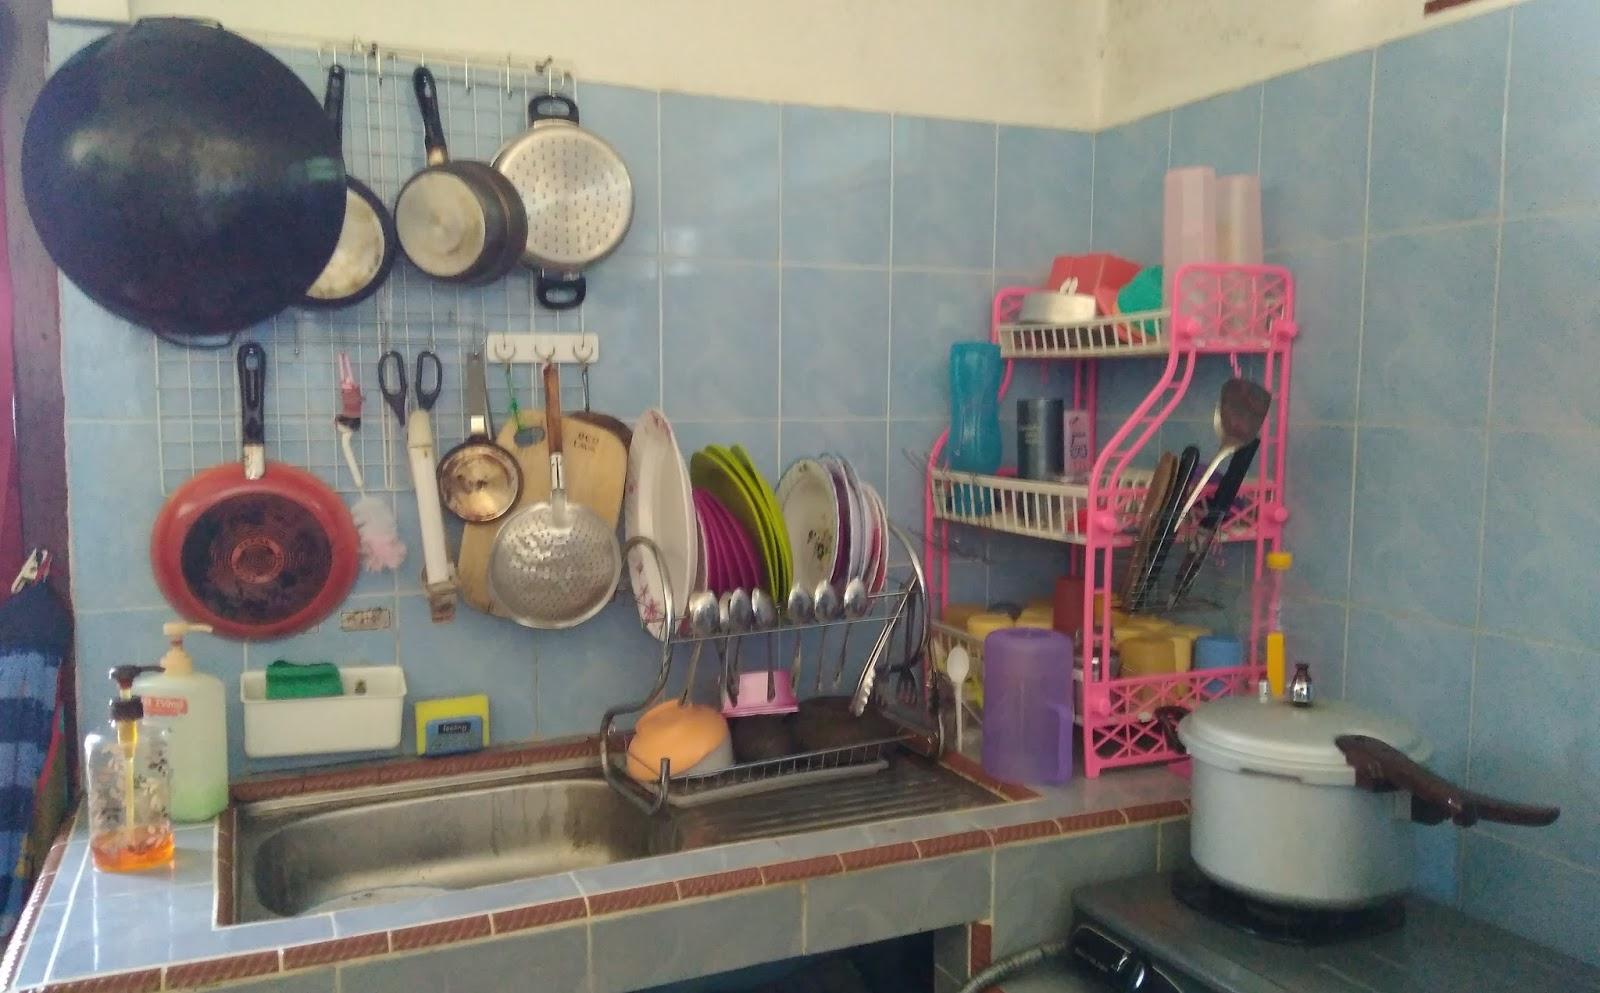 Mengenal Berbagai Bahaya Di Dapur Rumahan Dan Cara Mengatasinya